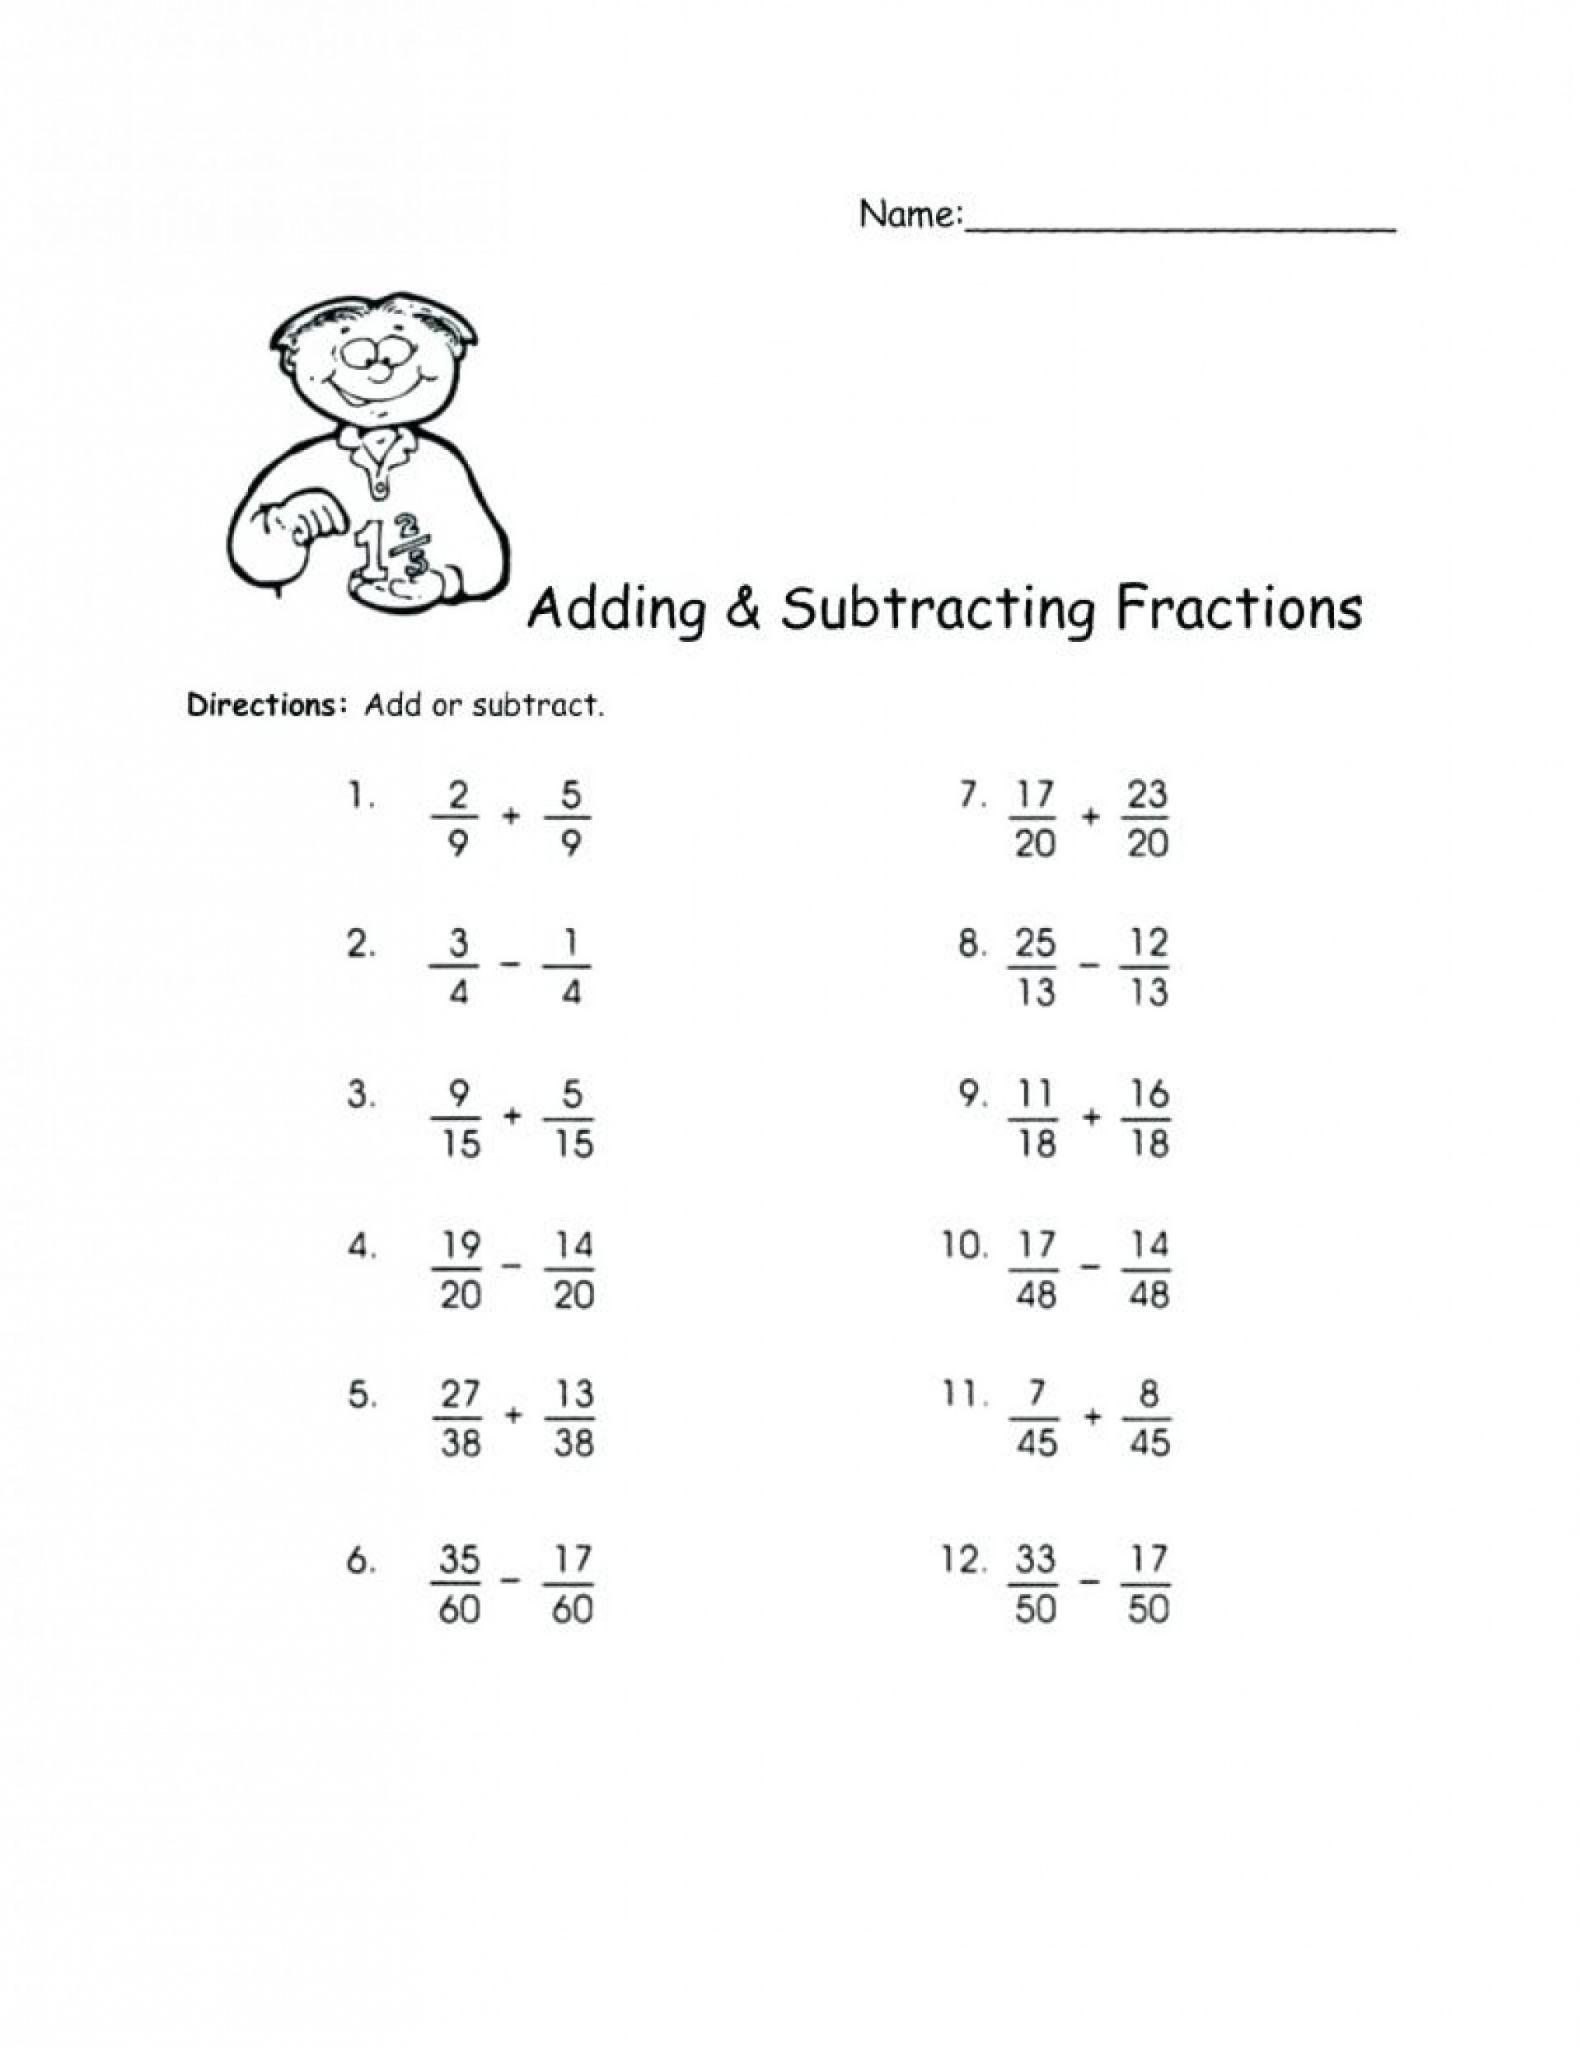 5 Free Math Worksheets Fourth Grade 4 Addition Adding 2